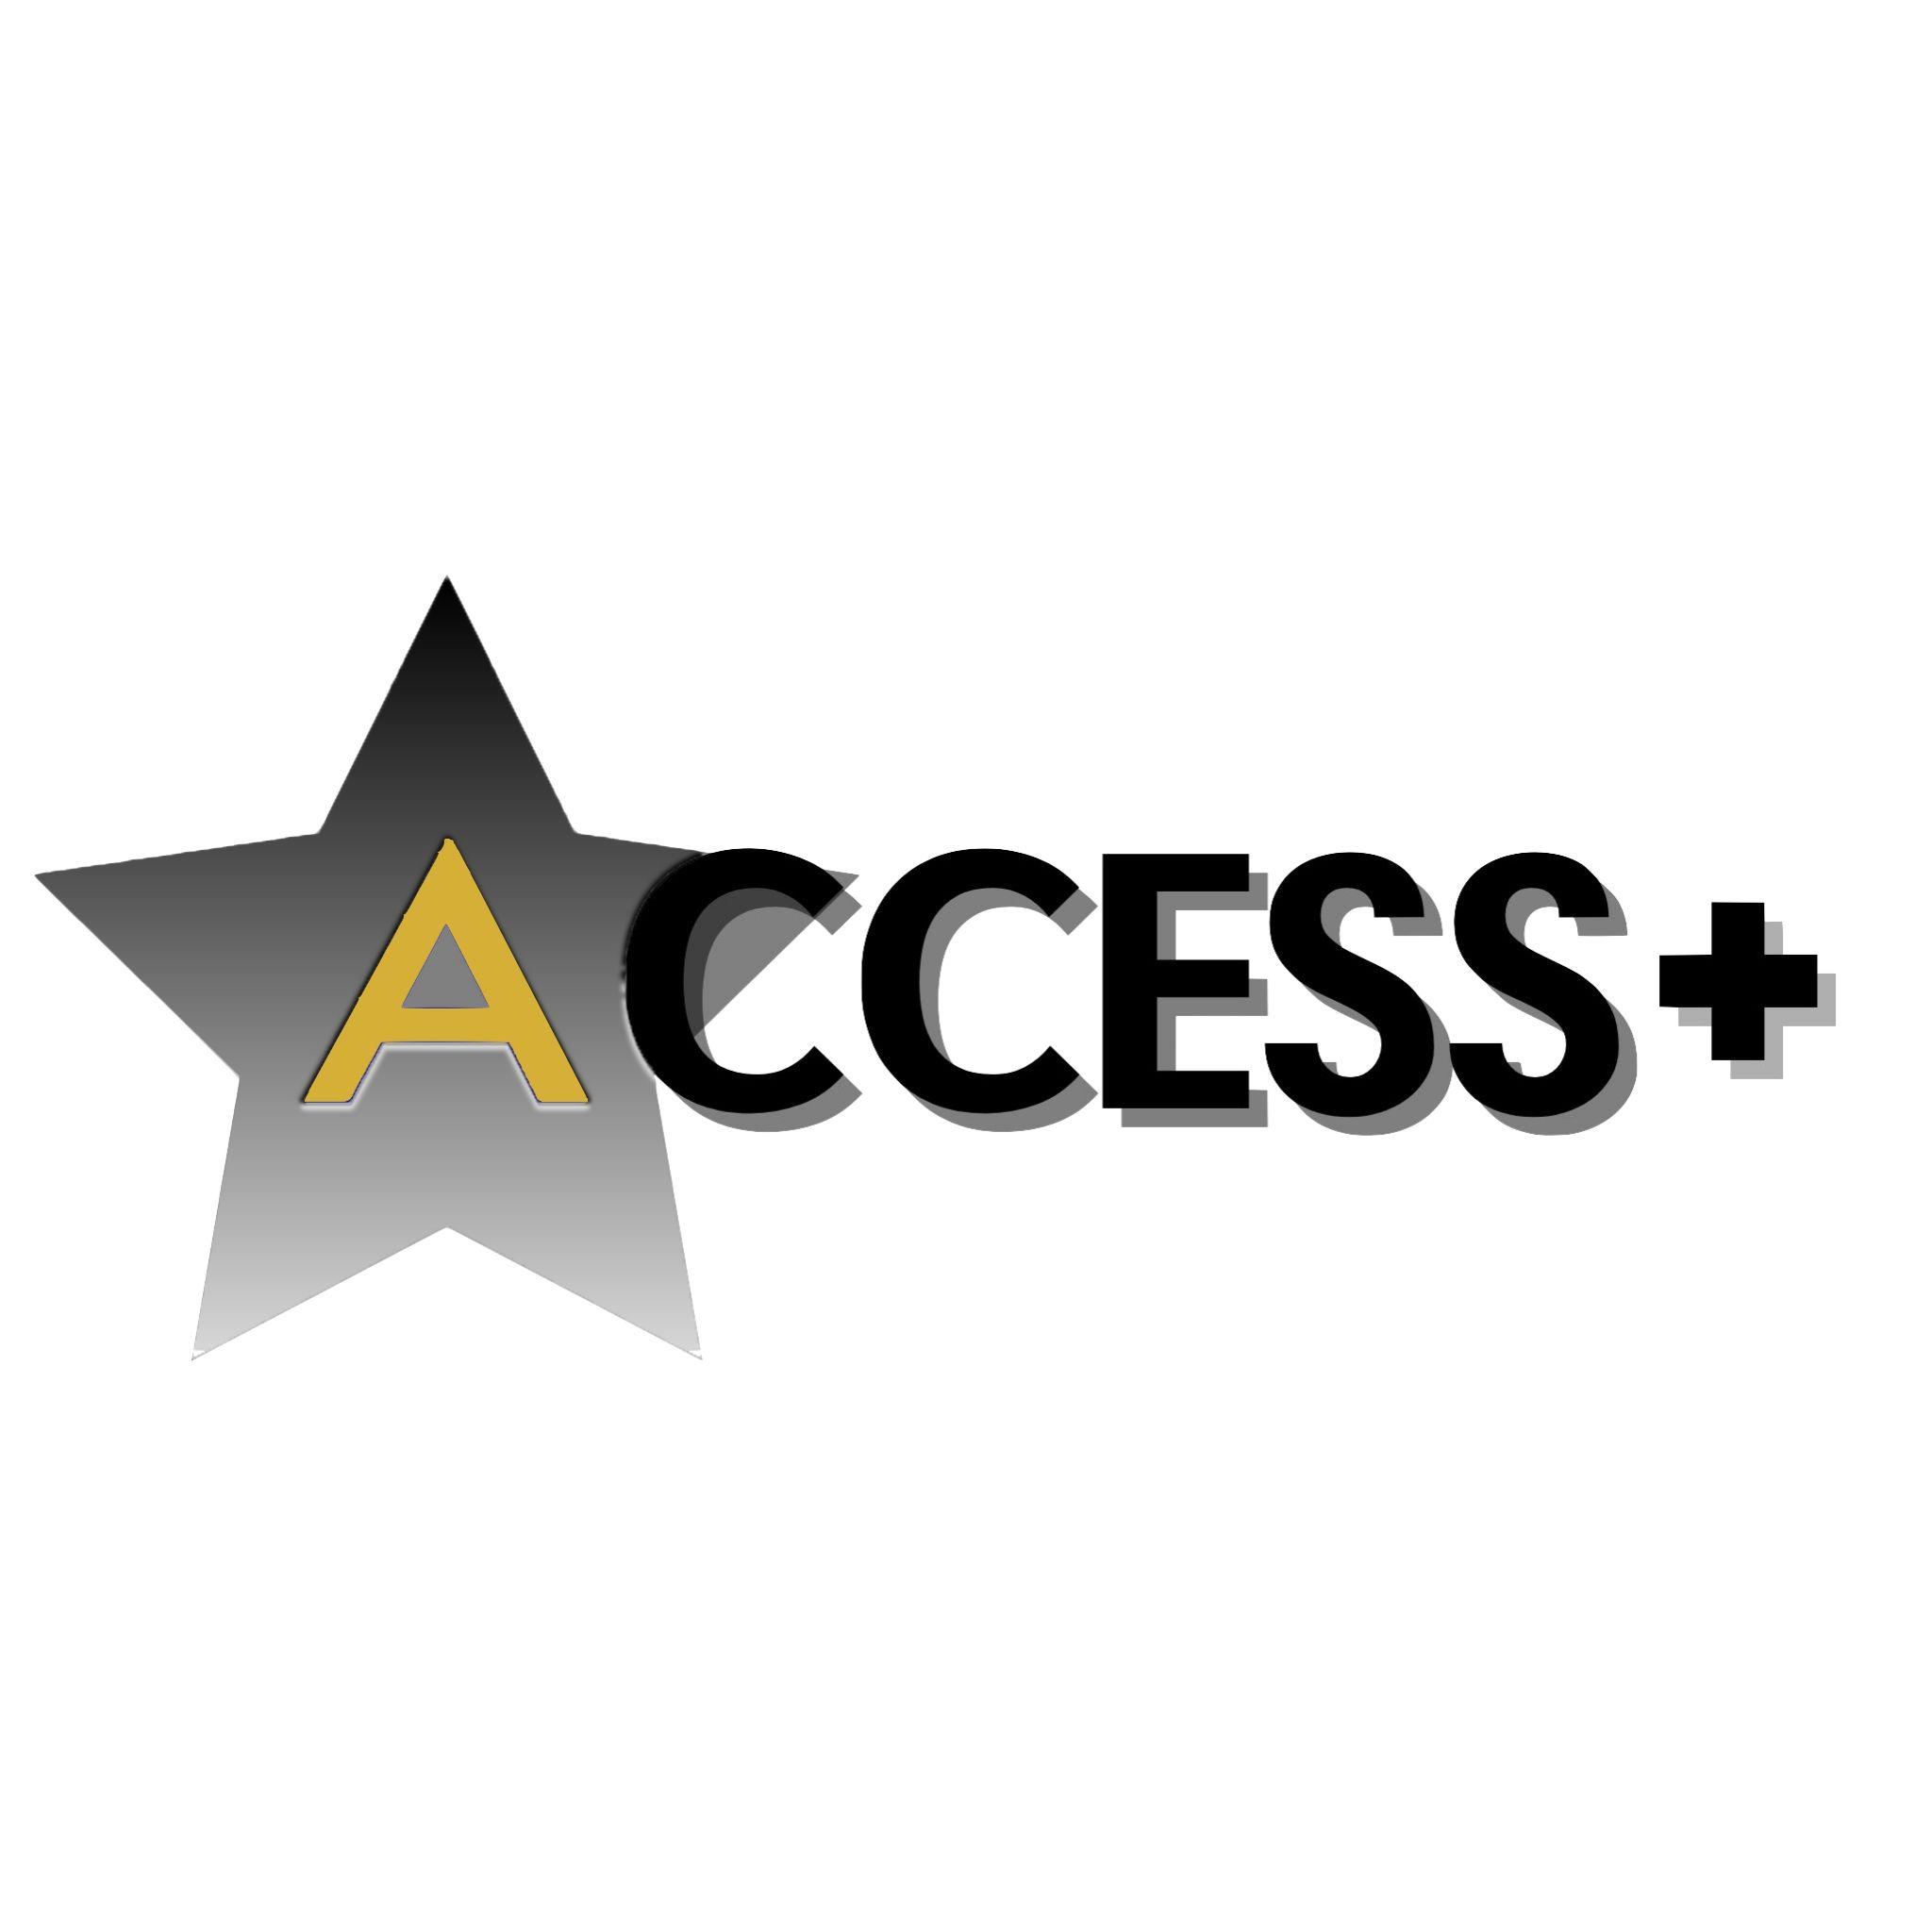 Access Plus Gold.jpg